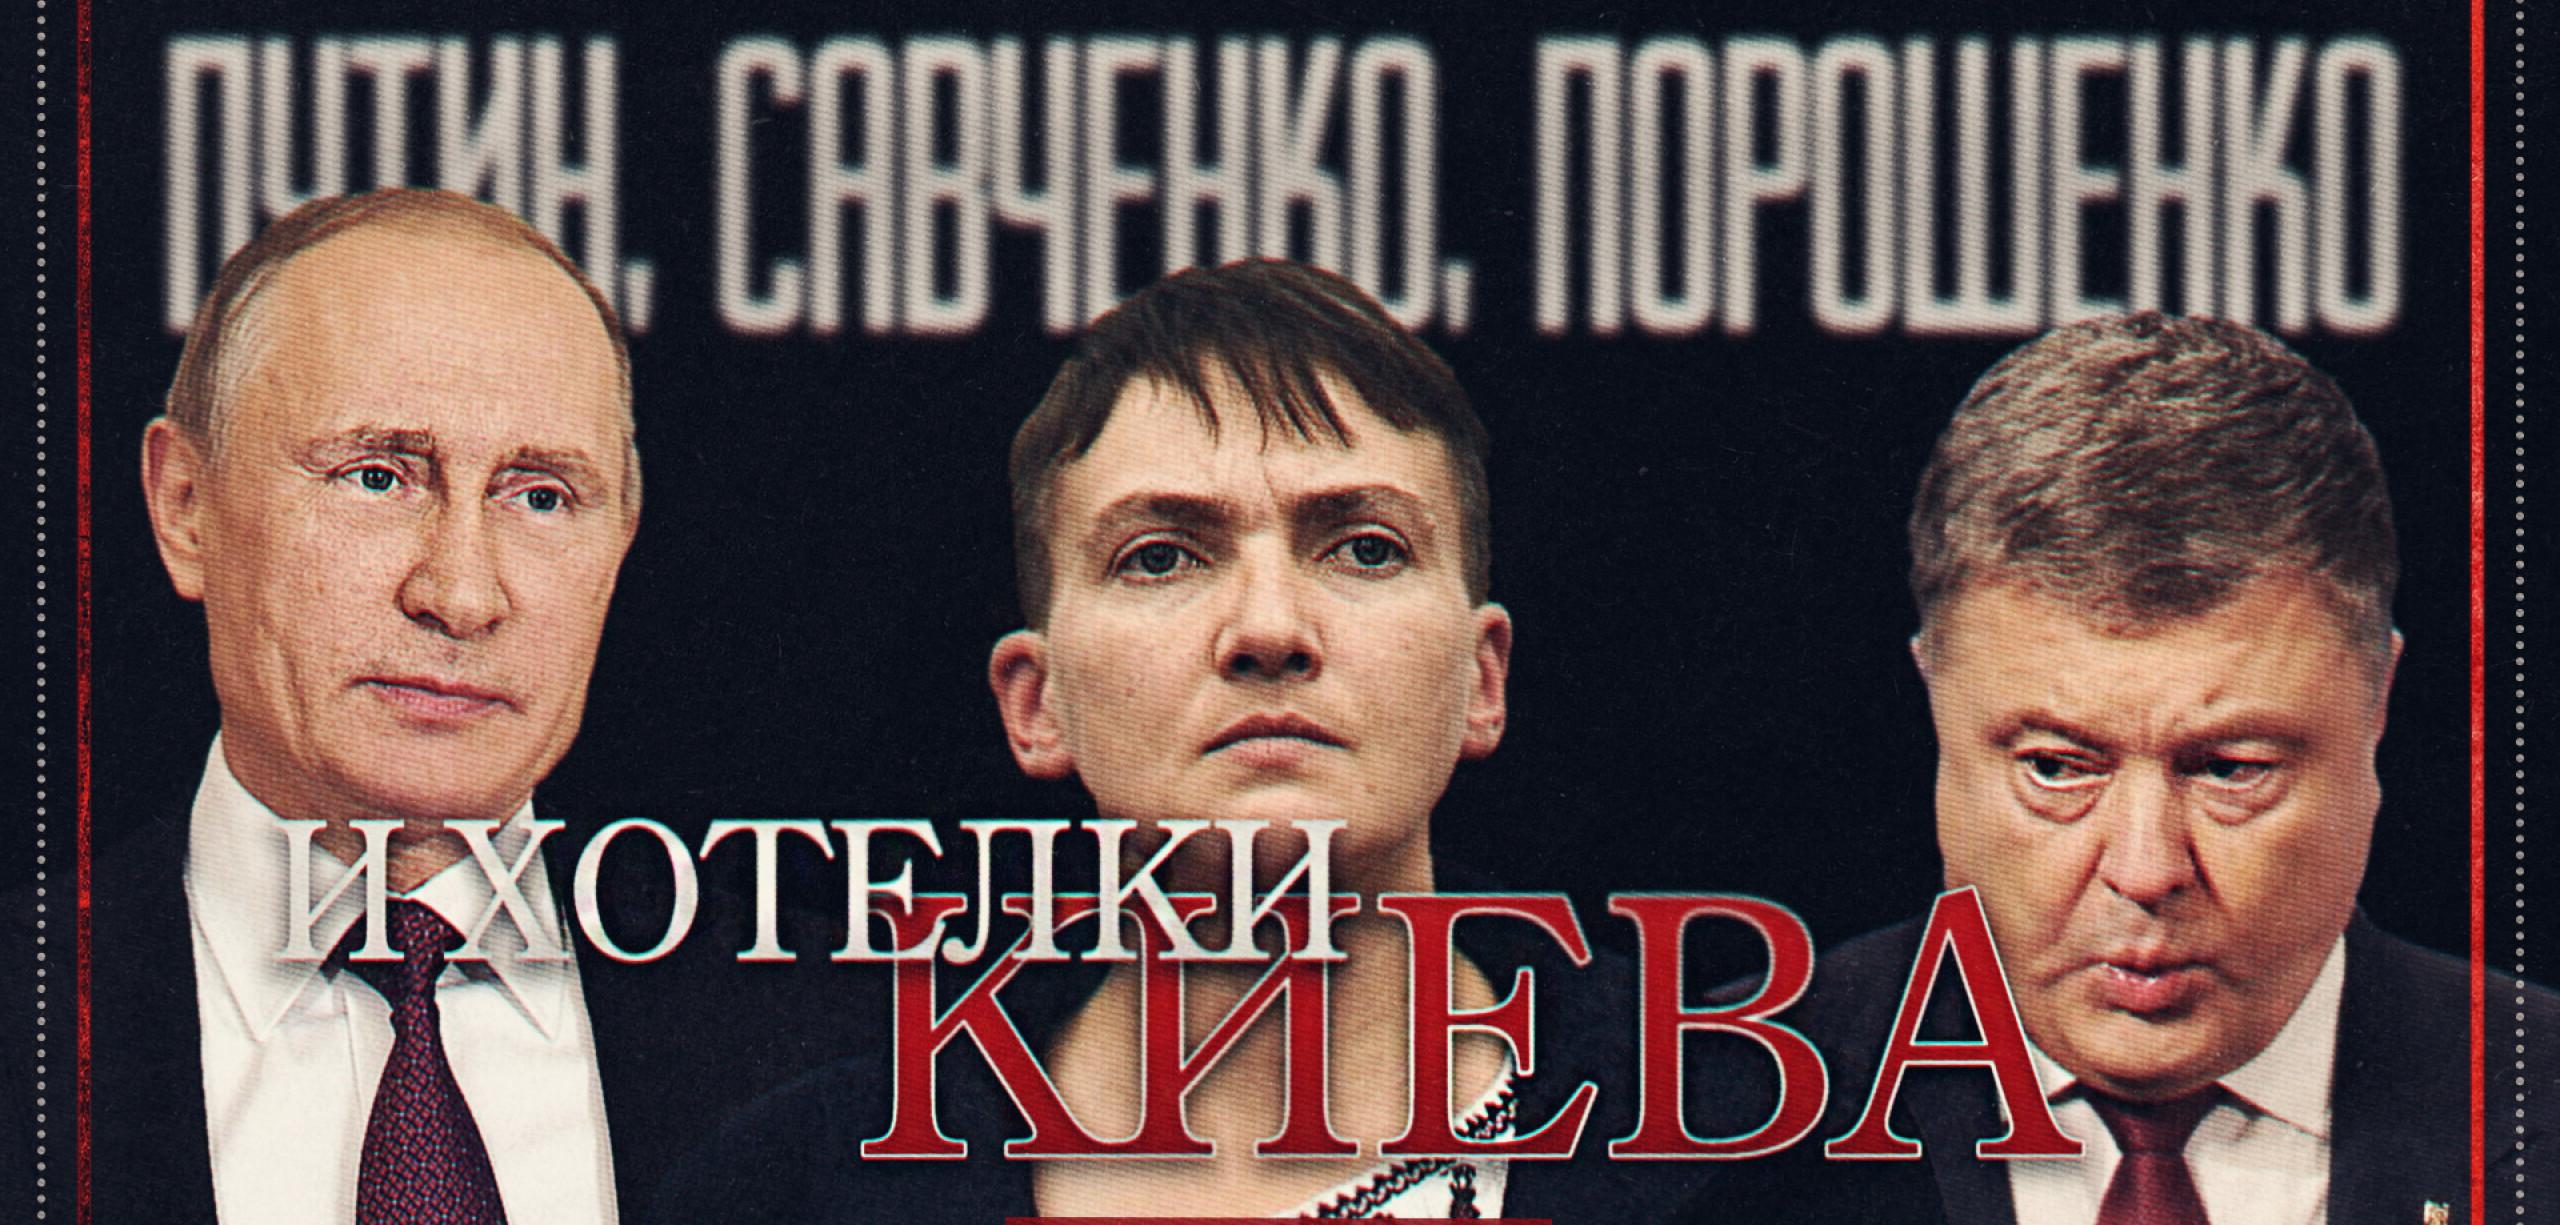 Савченко, Порошенко, Путин и хотелки Киева